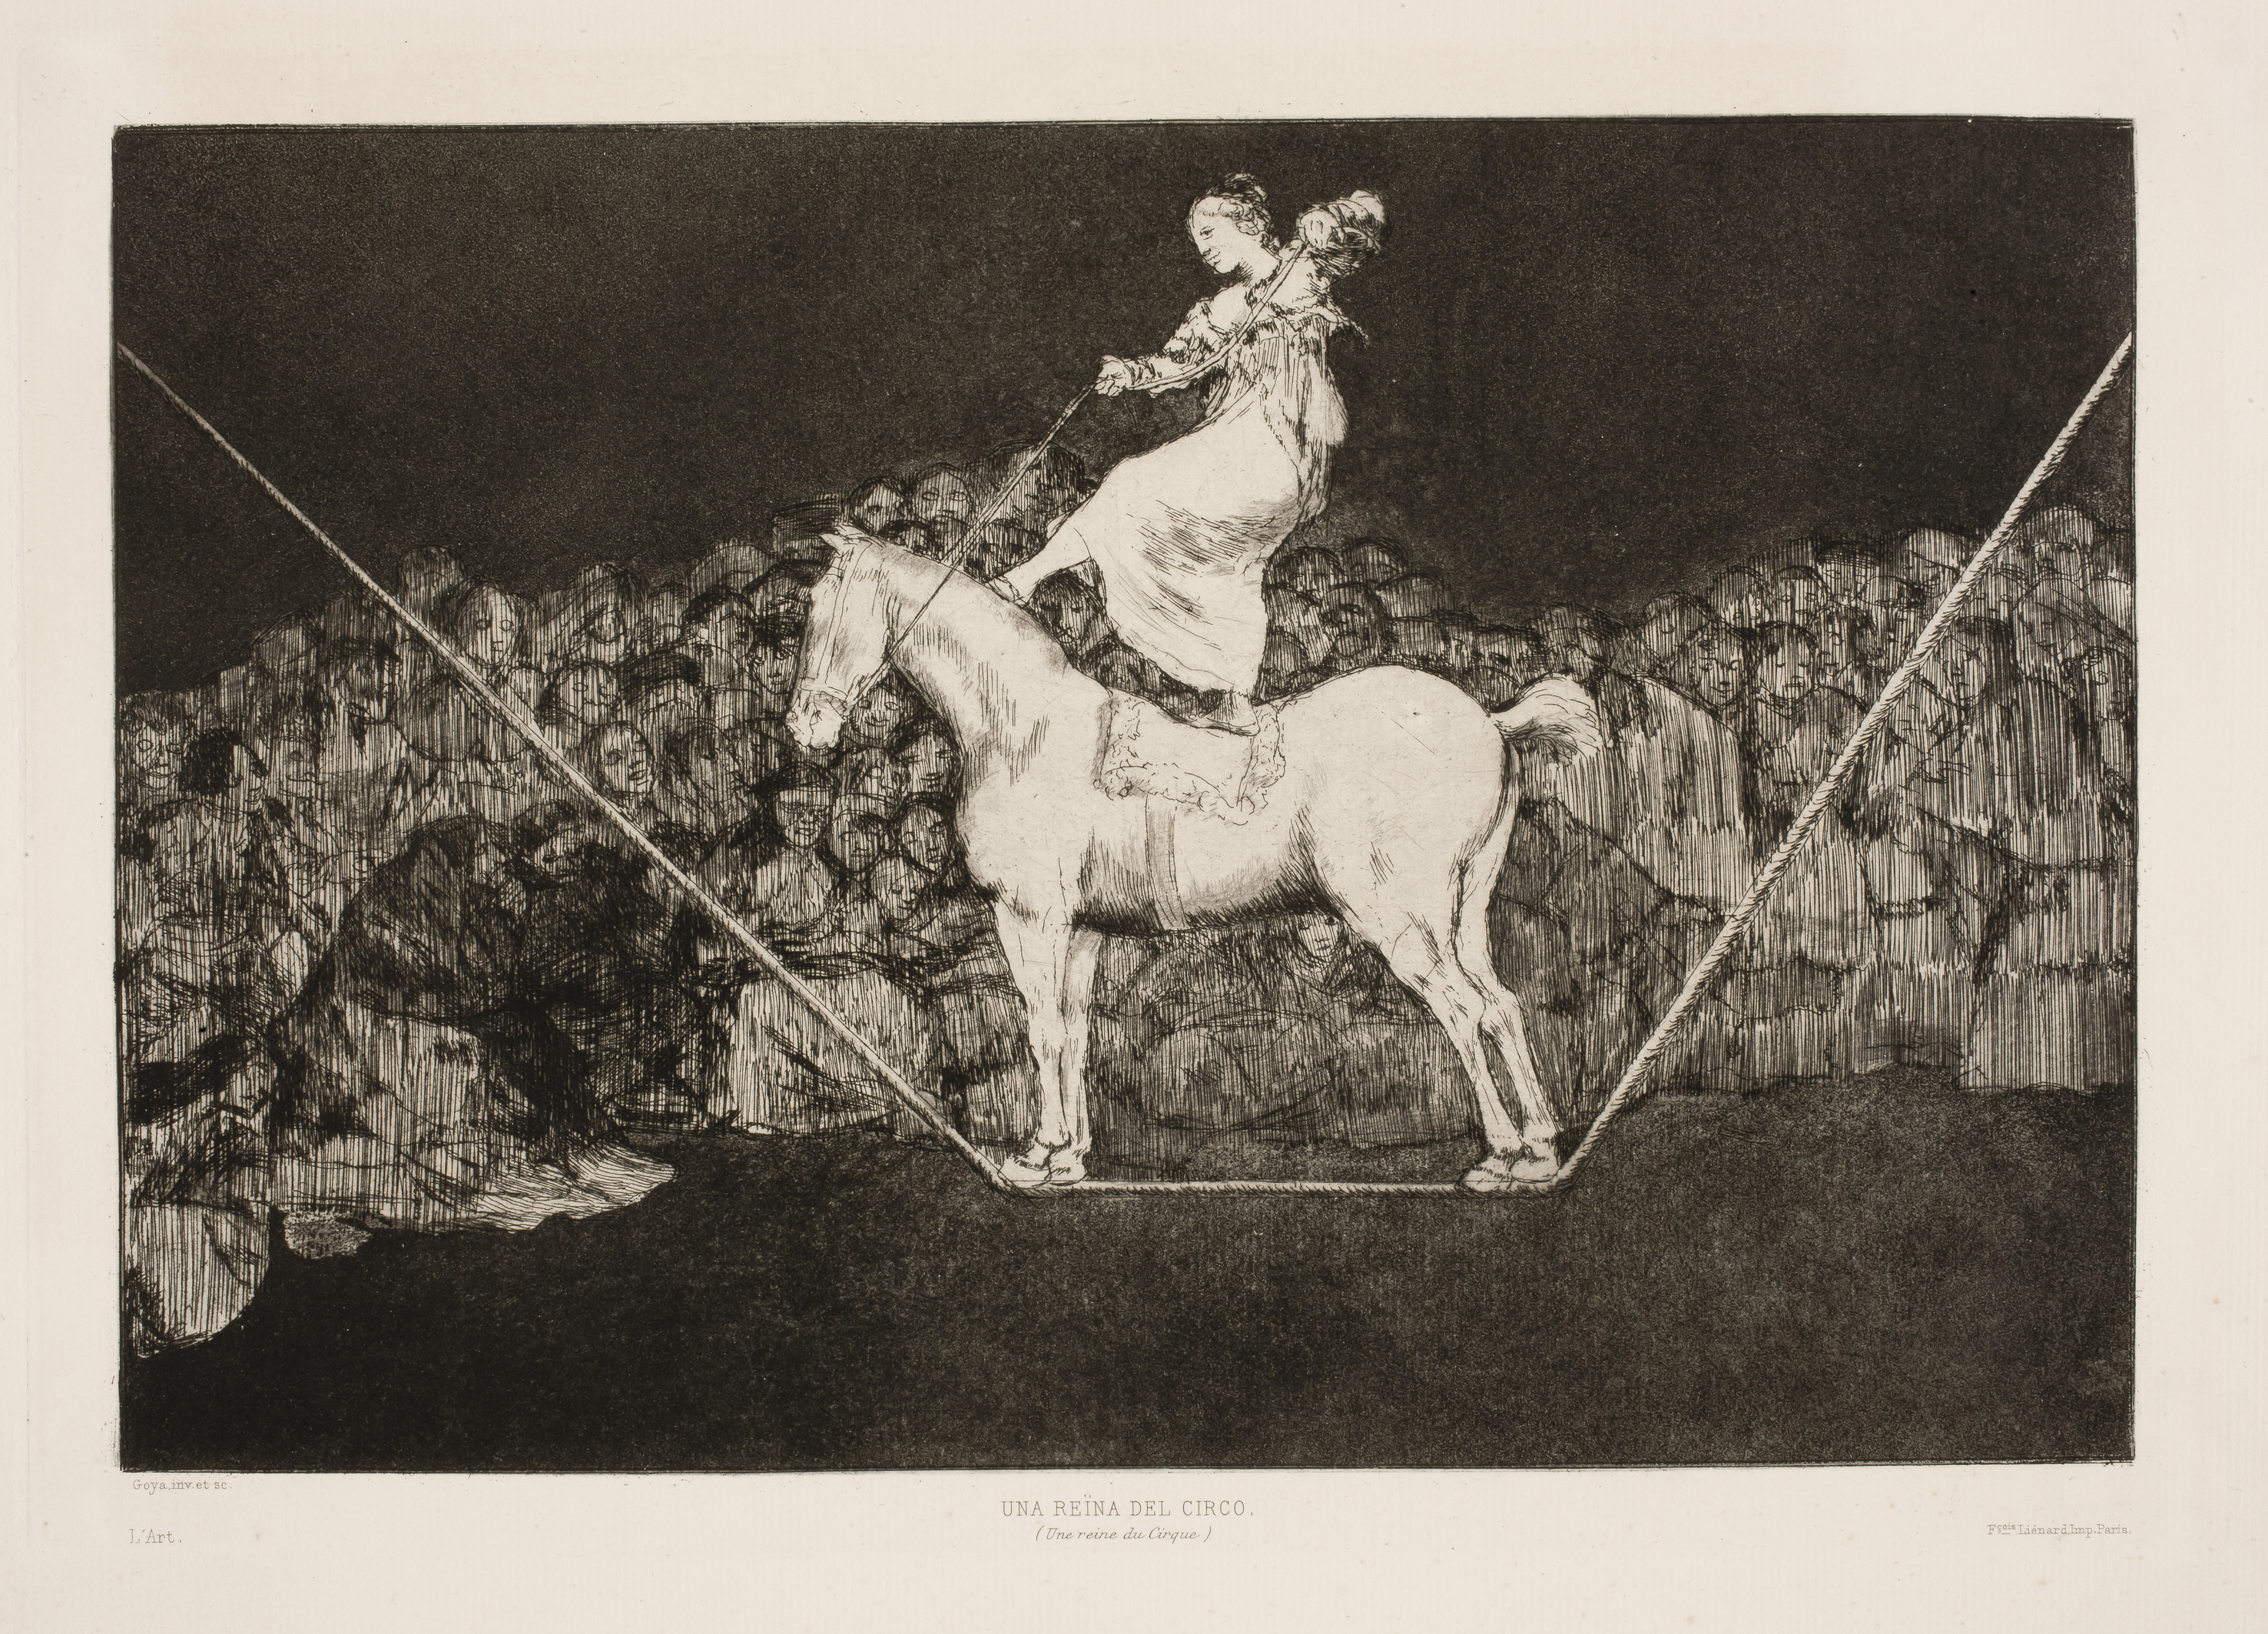 Goya S The Third Of May  Illustrates This Design Principle